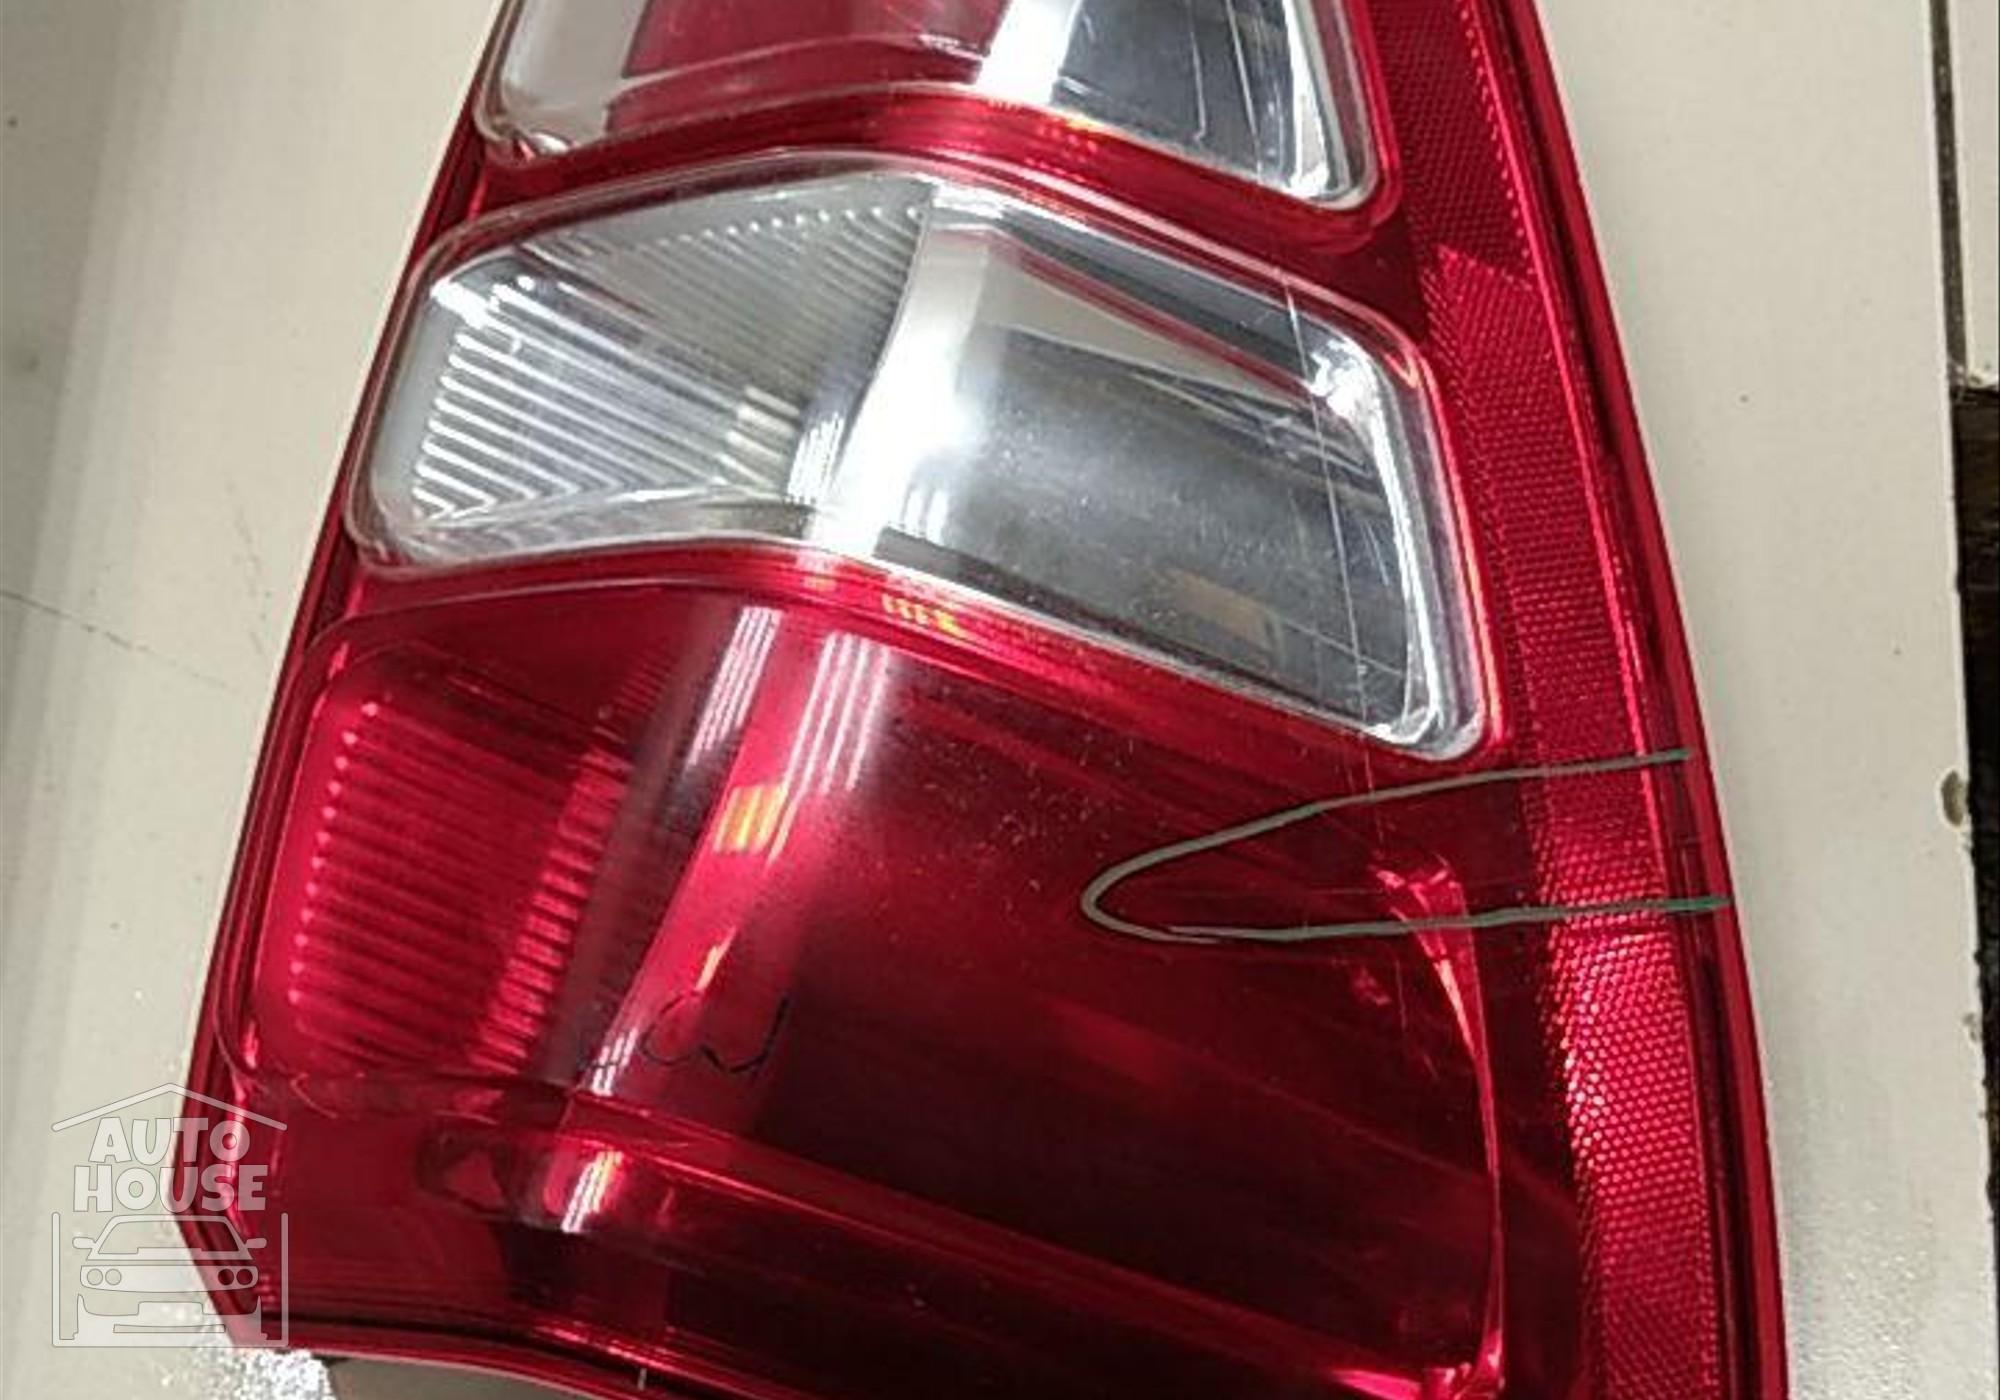 3567065J11 Фонарь задний левый для Suzuki Grand Vitara II (с 2005 по 2015)